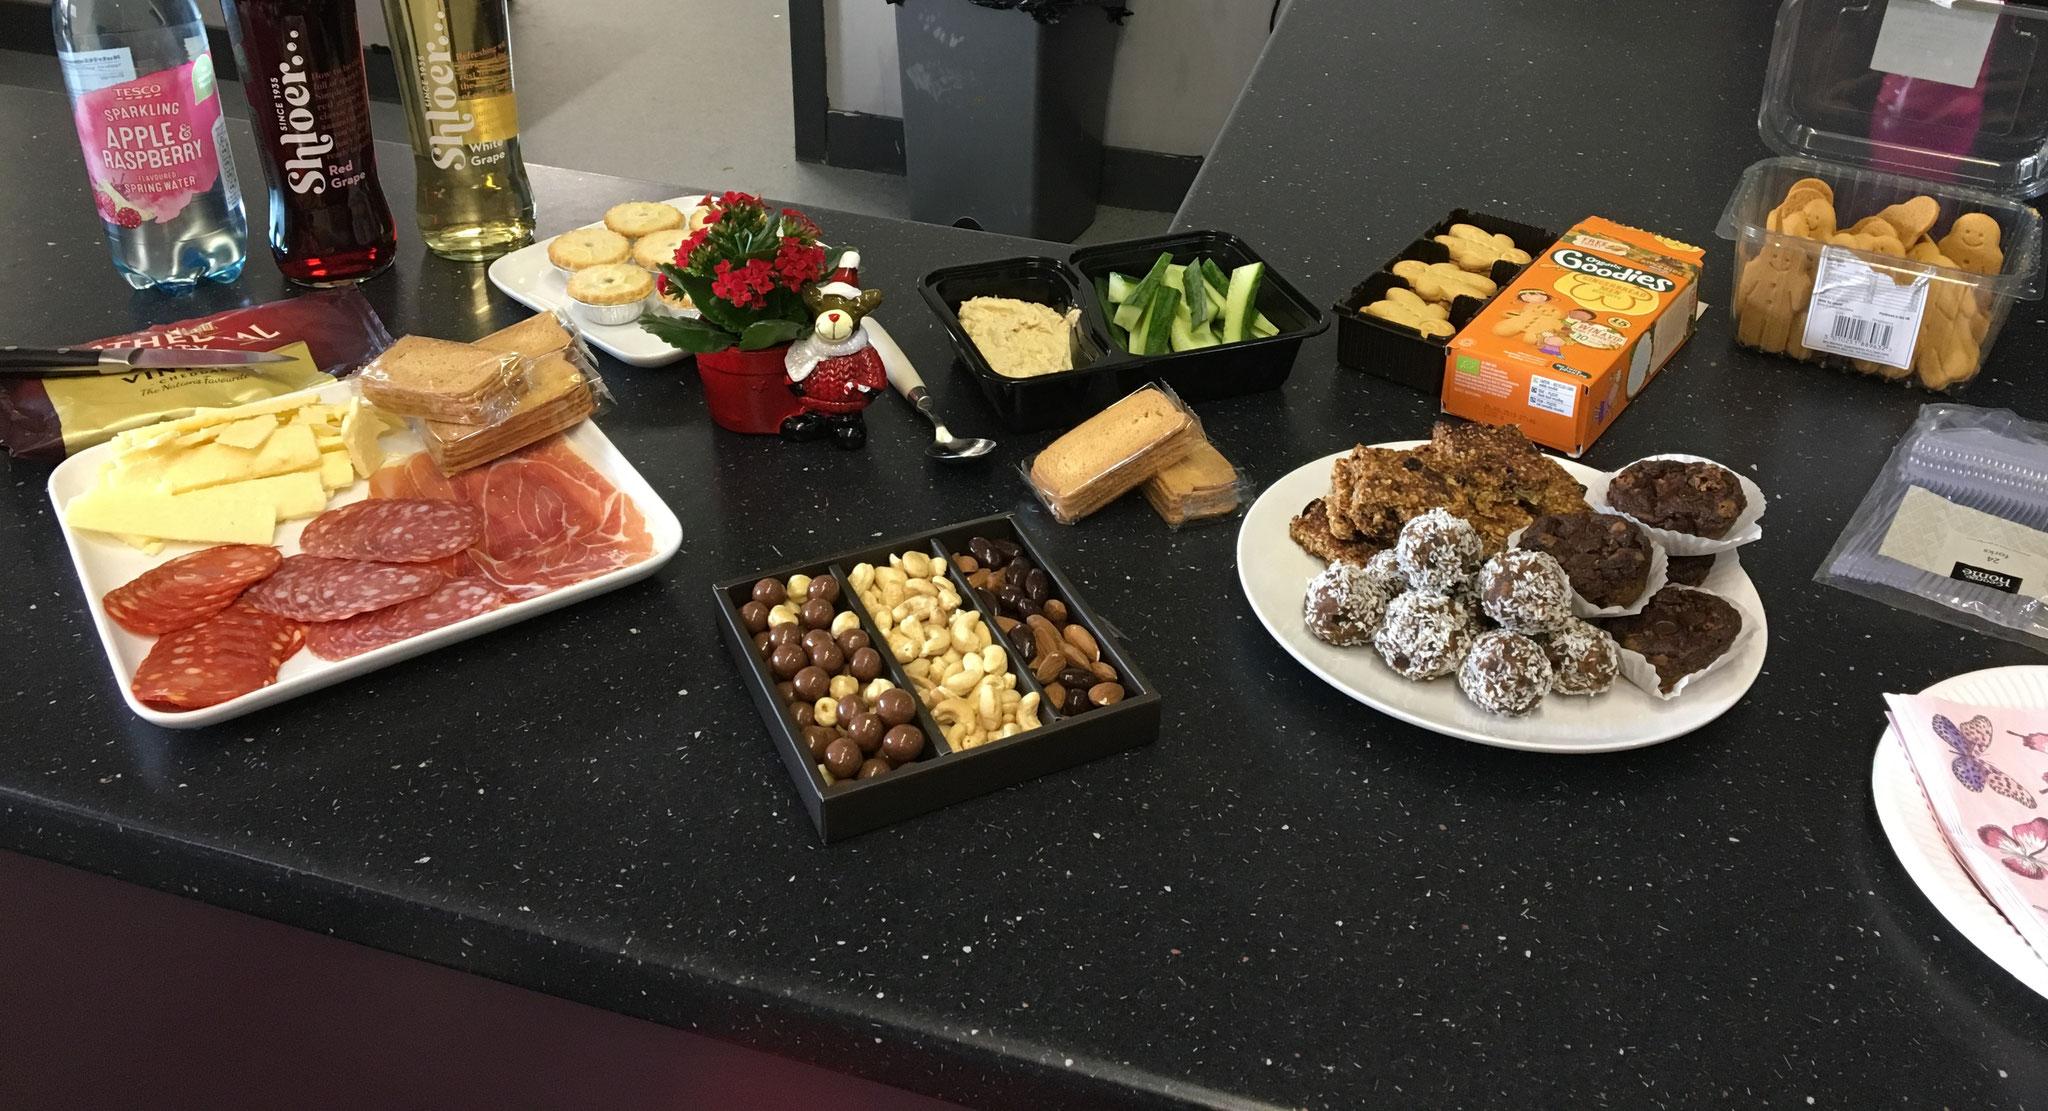 Xmas Nibbles - homemade healthy snacks!